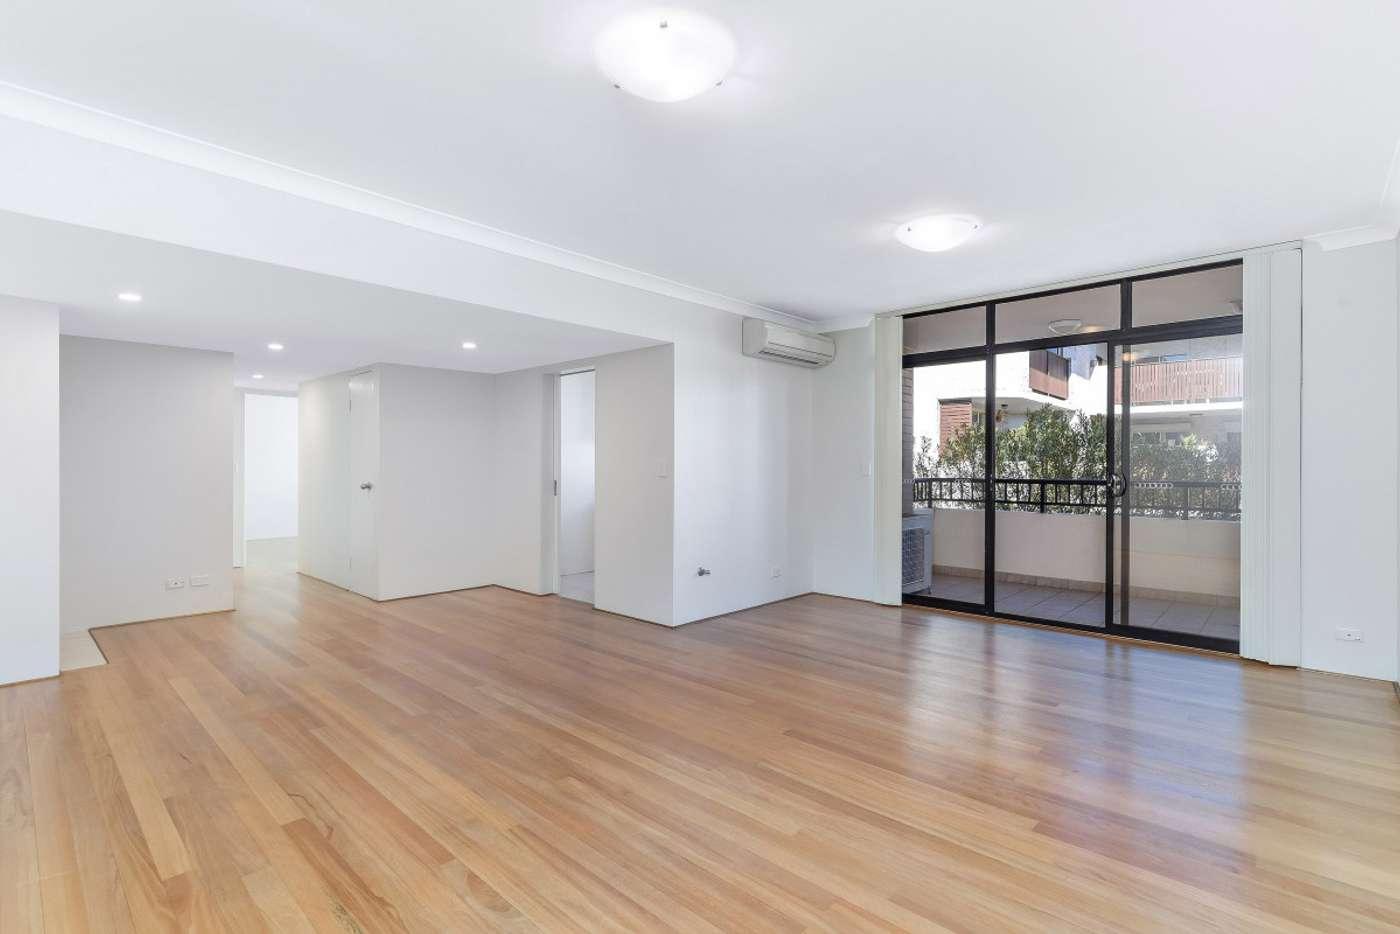 Main view of Homely apartment listing, 5/297 Bondi Road, Bondi Beach NSW 2026